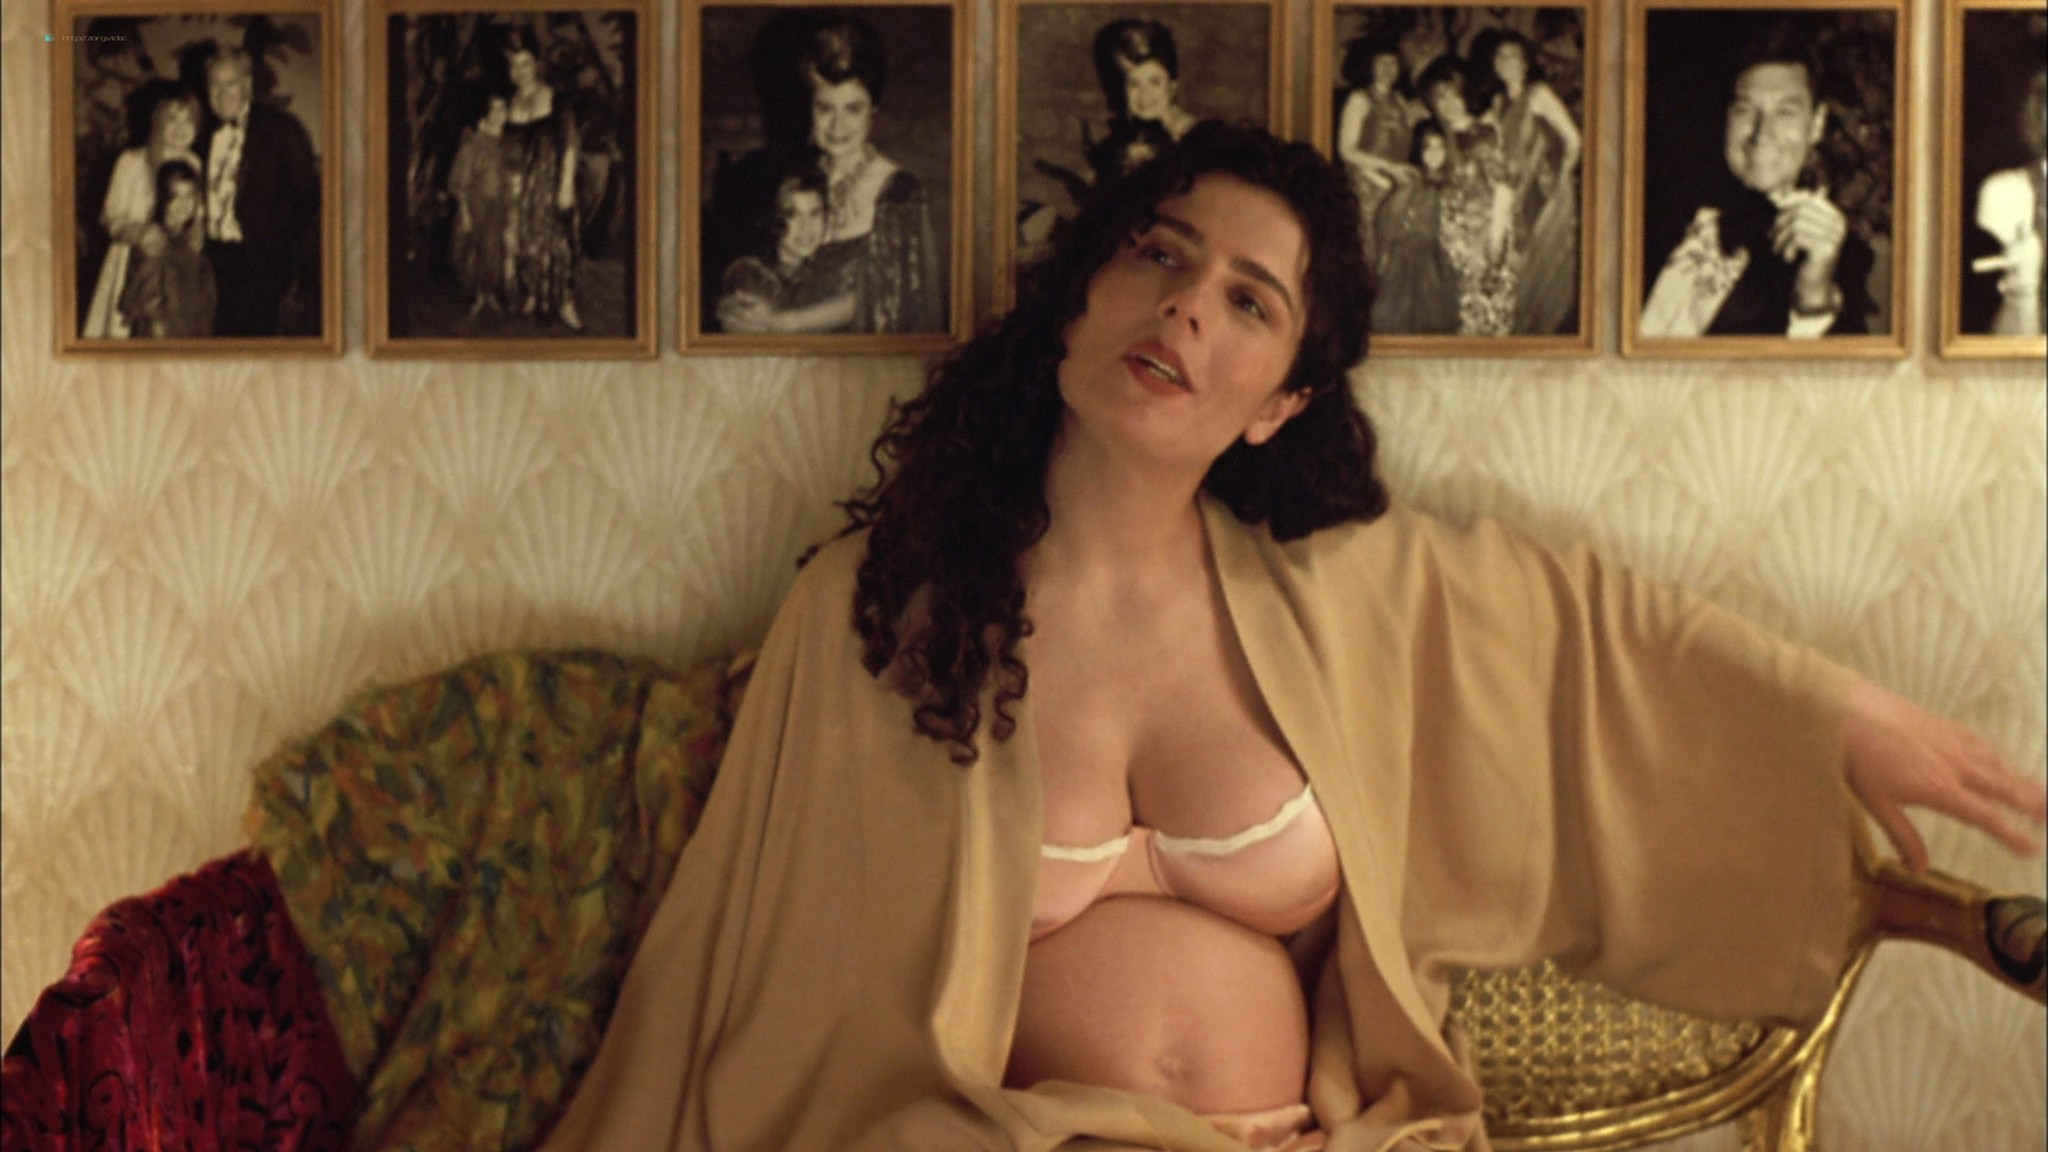 Mia Kirshner nude Arsinée Khanjian sexy - Exotica (1994) HD 1080p BluRay REMUX (12)